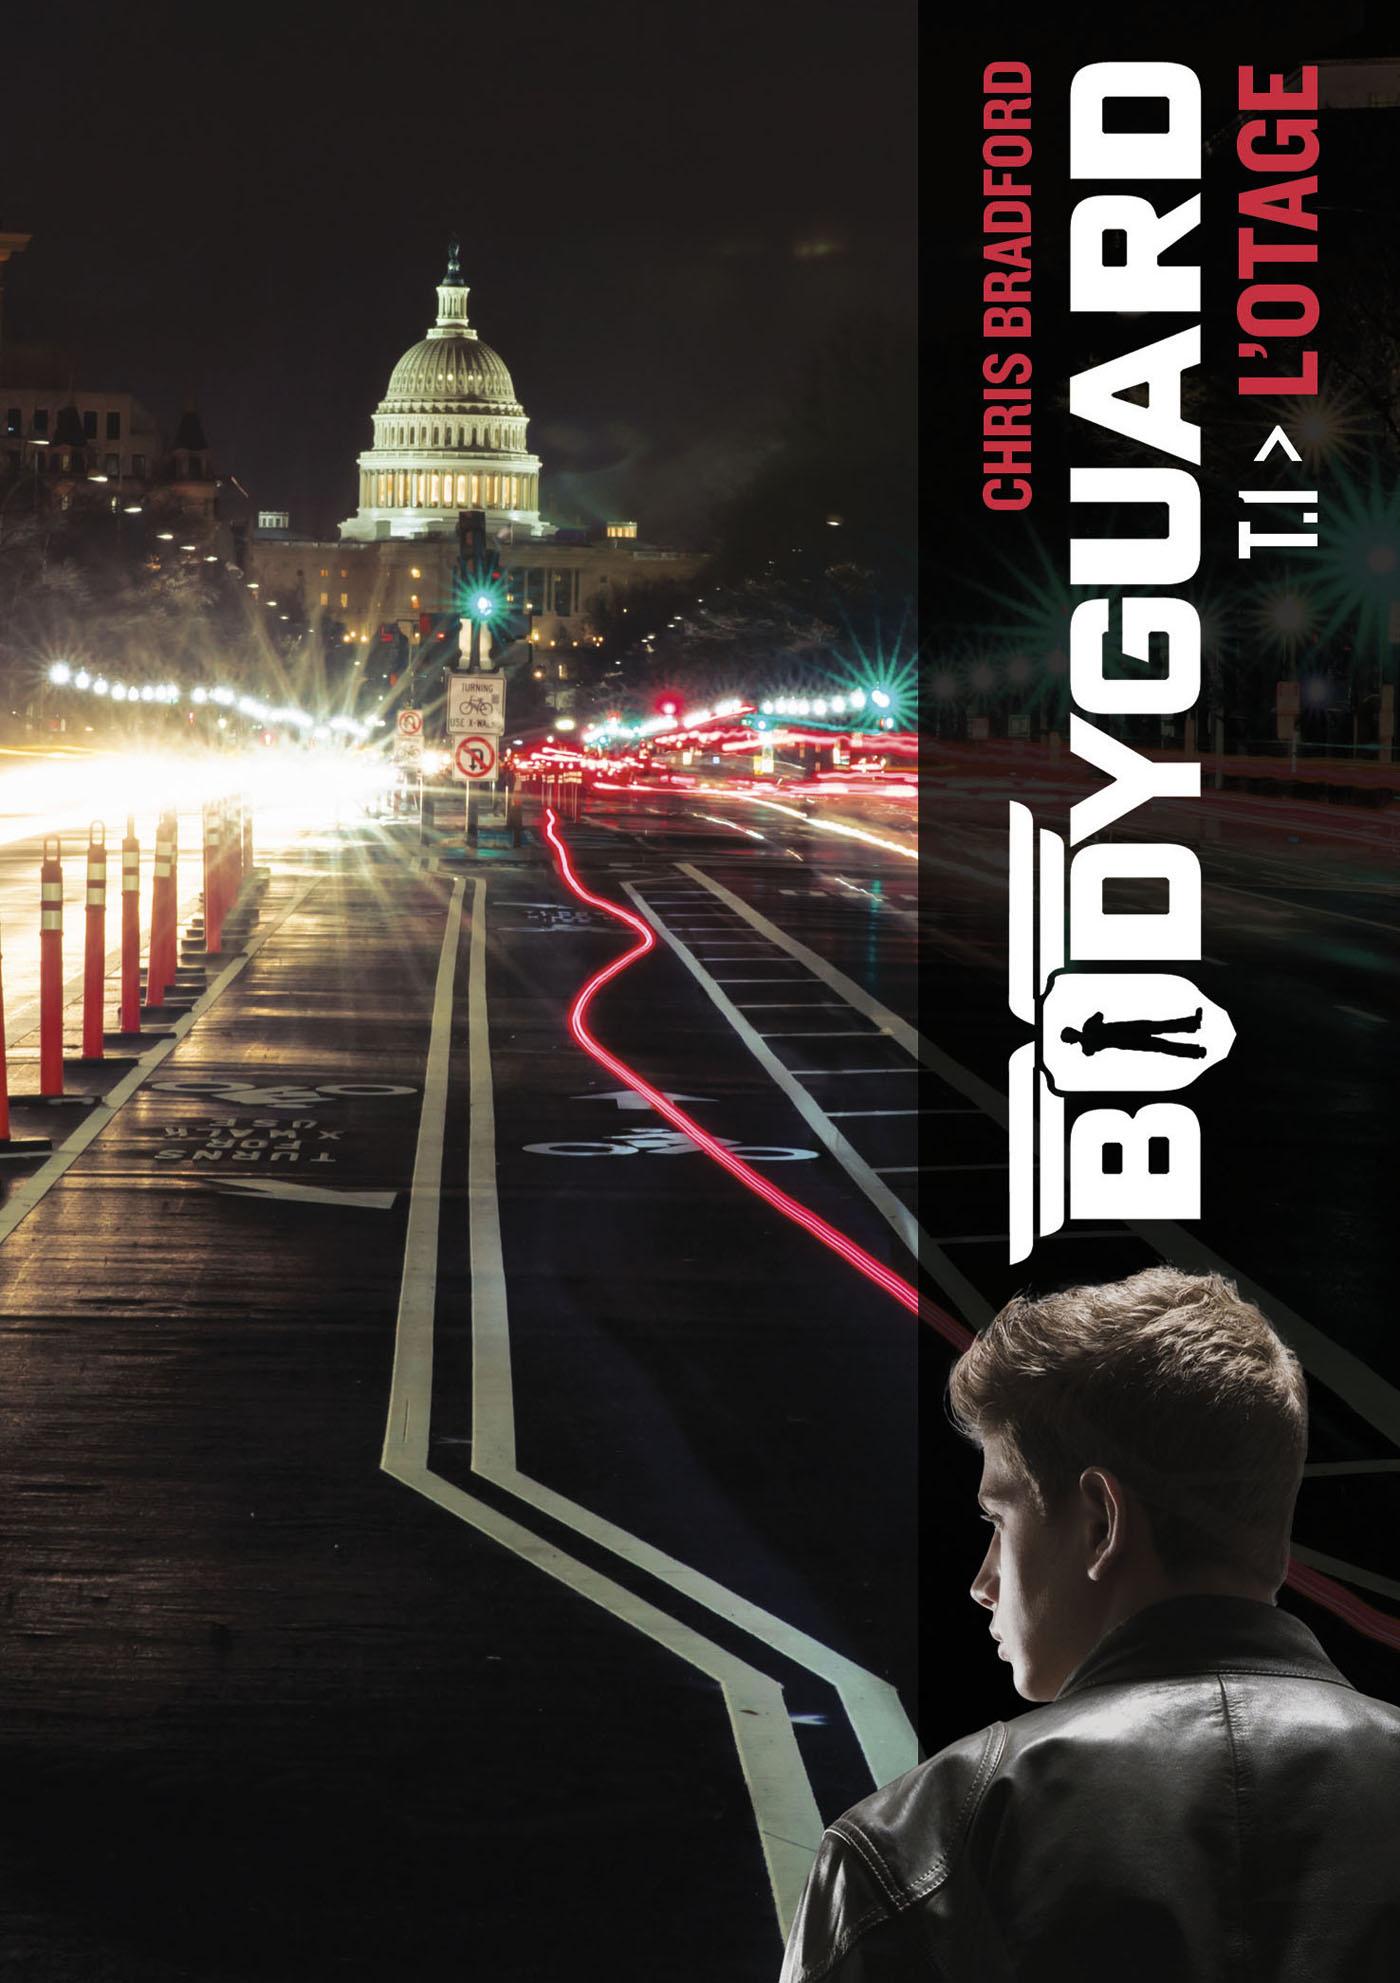 Bodyguard (Tome 1) - L'otage